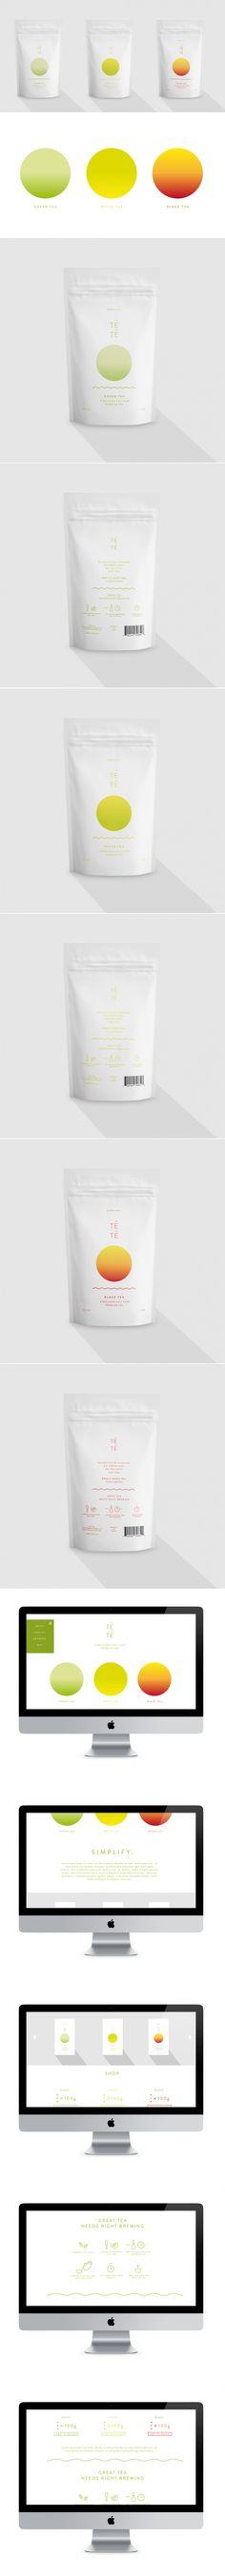 Têtê Tea — The Dieline   Packaging & Branding Design & Innovation News